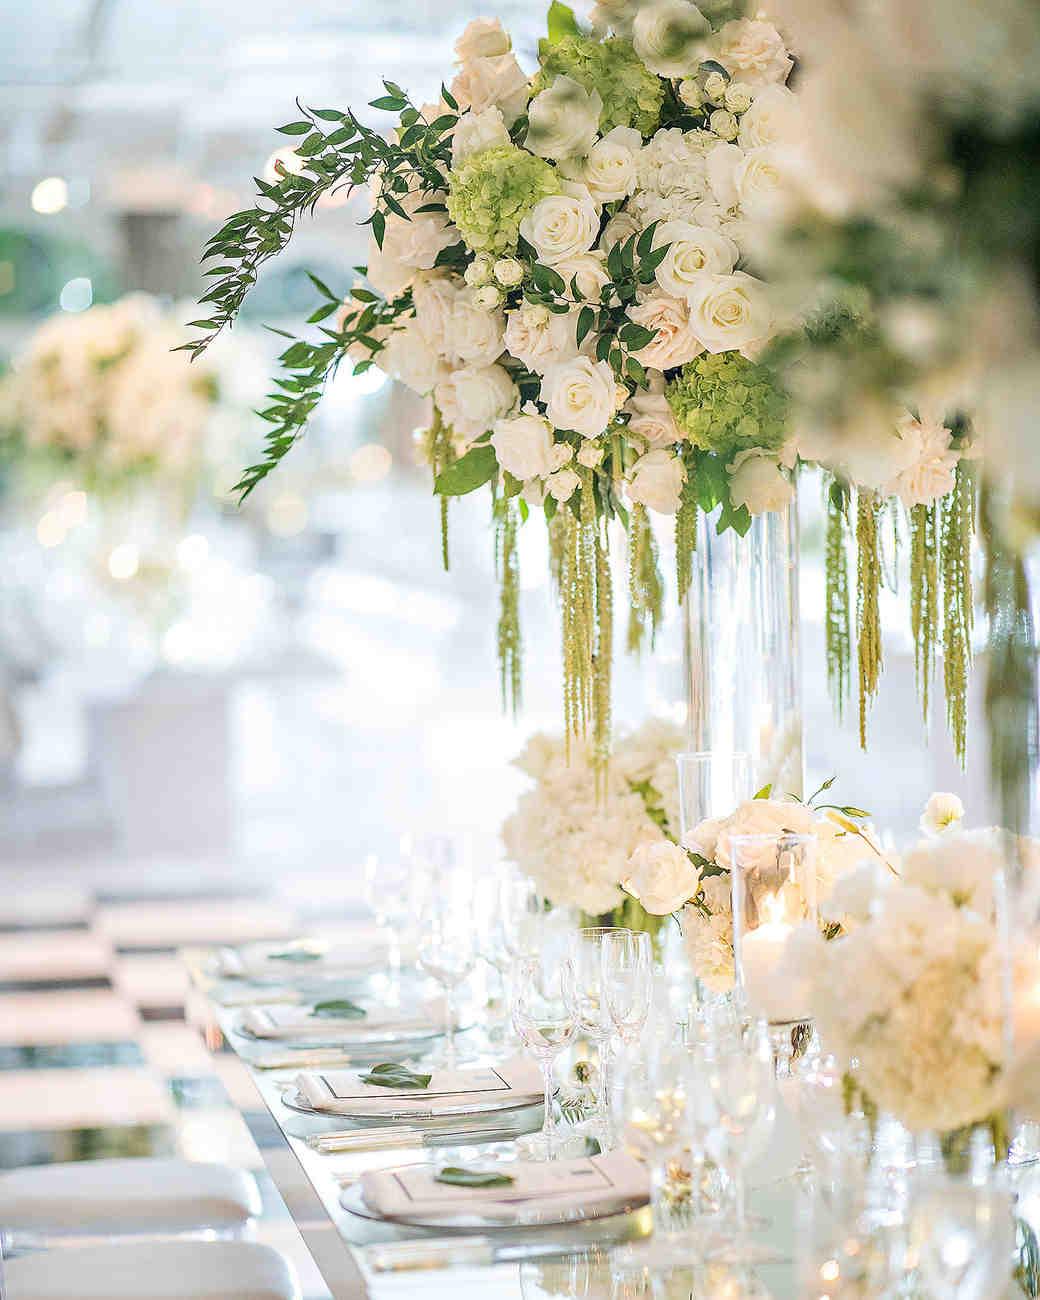 danielle kevin wedding flower centerpieces